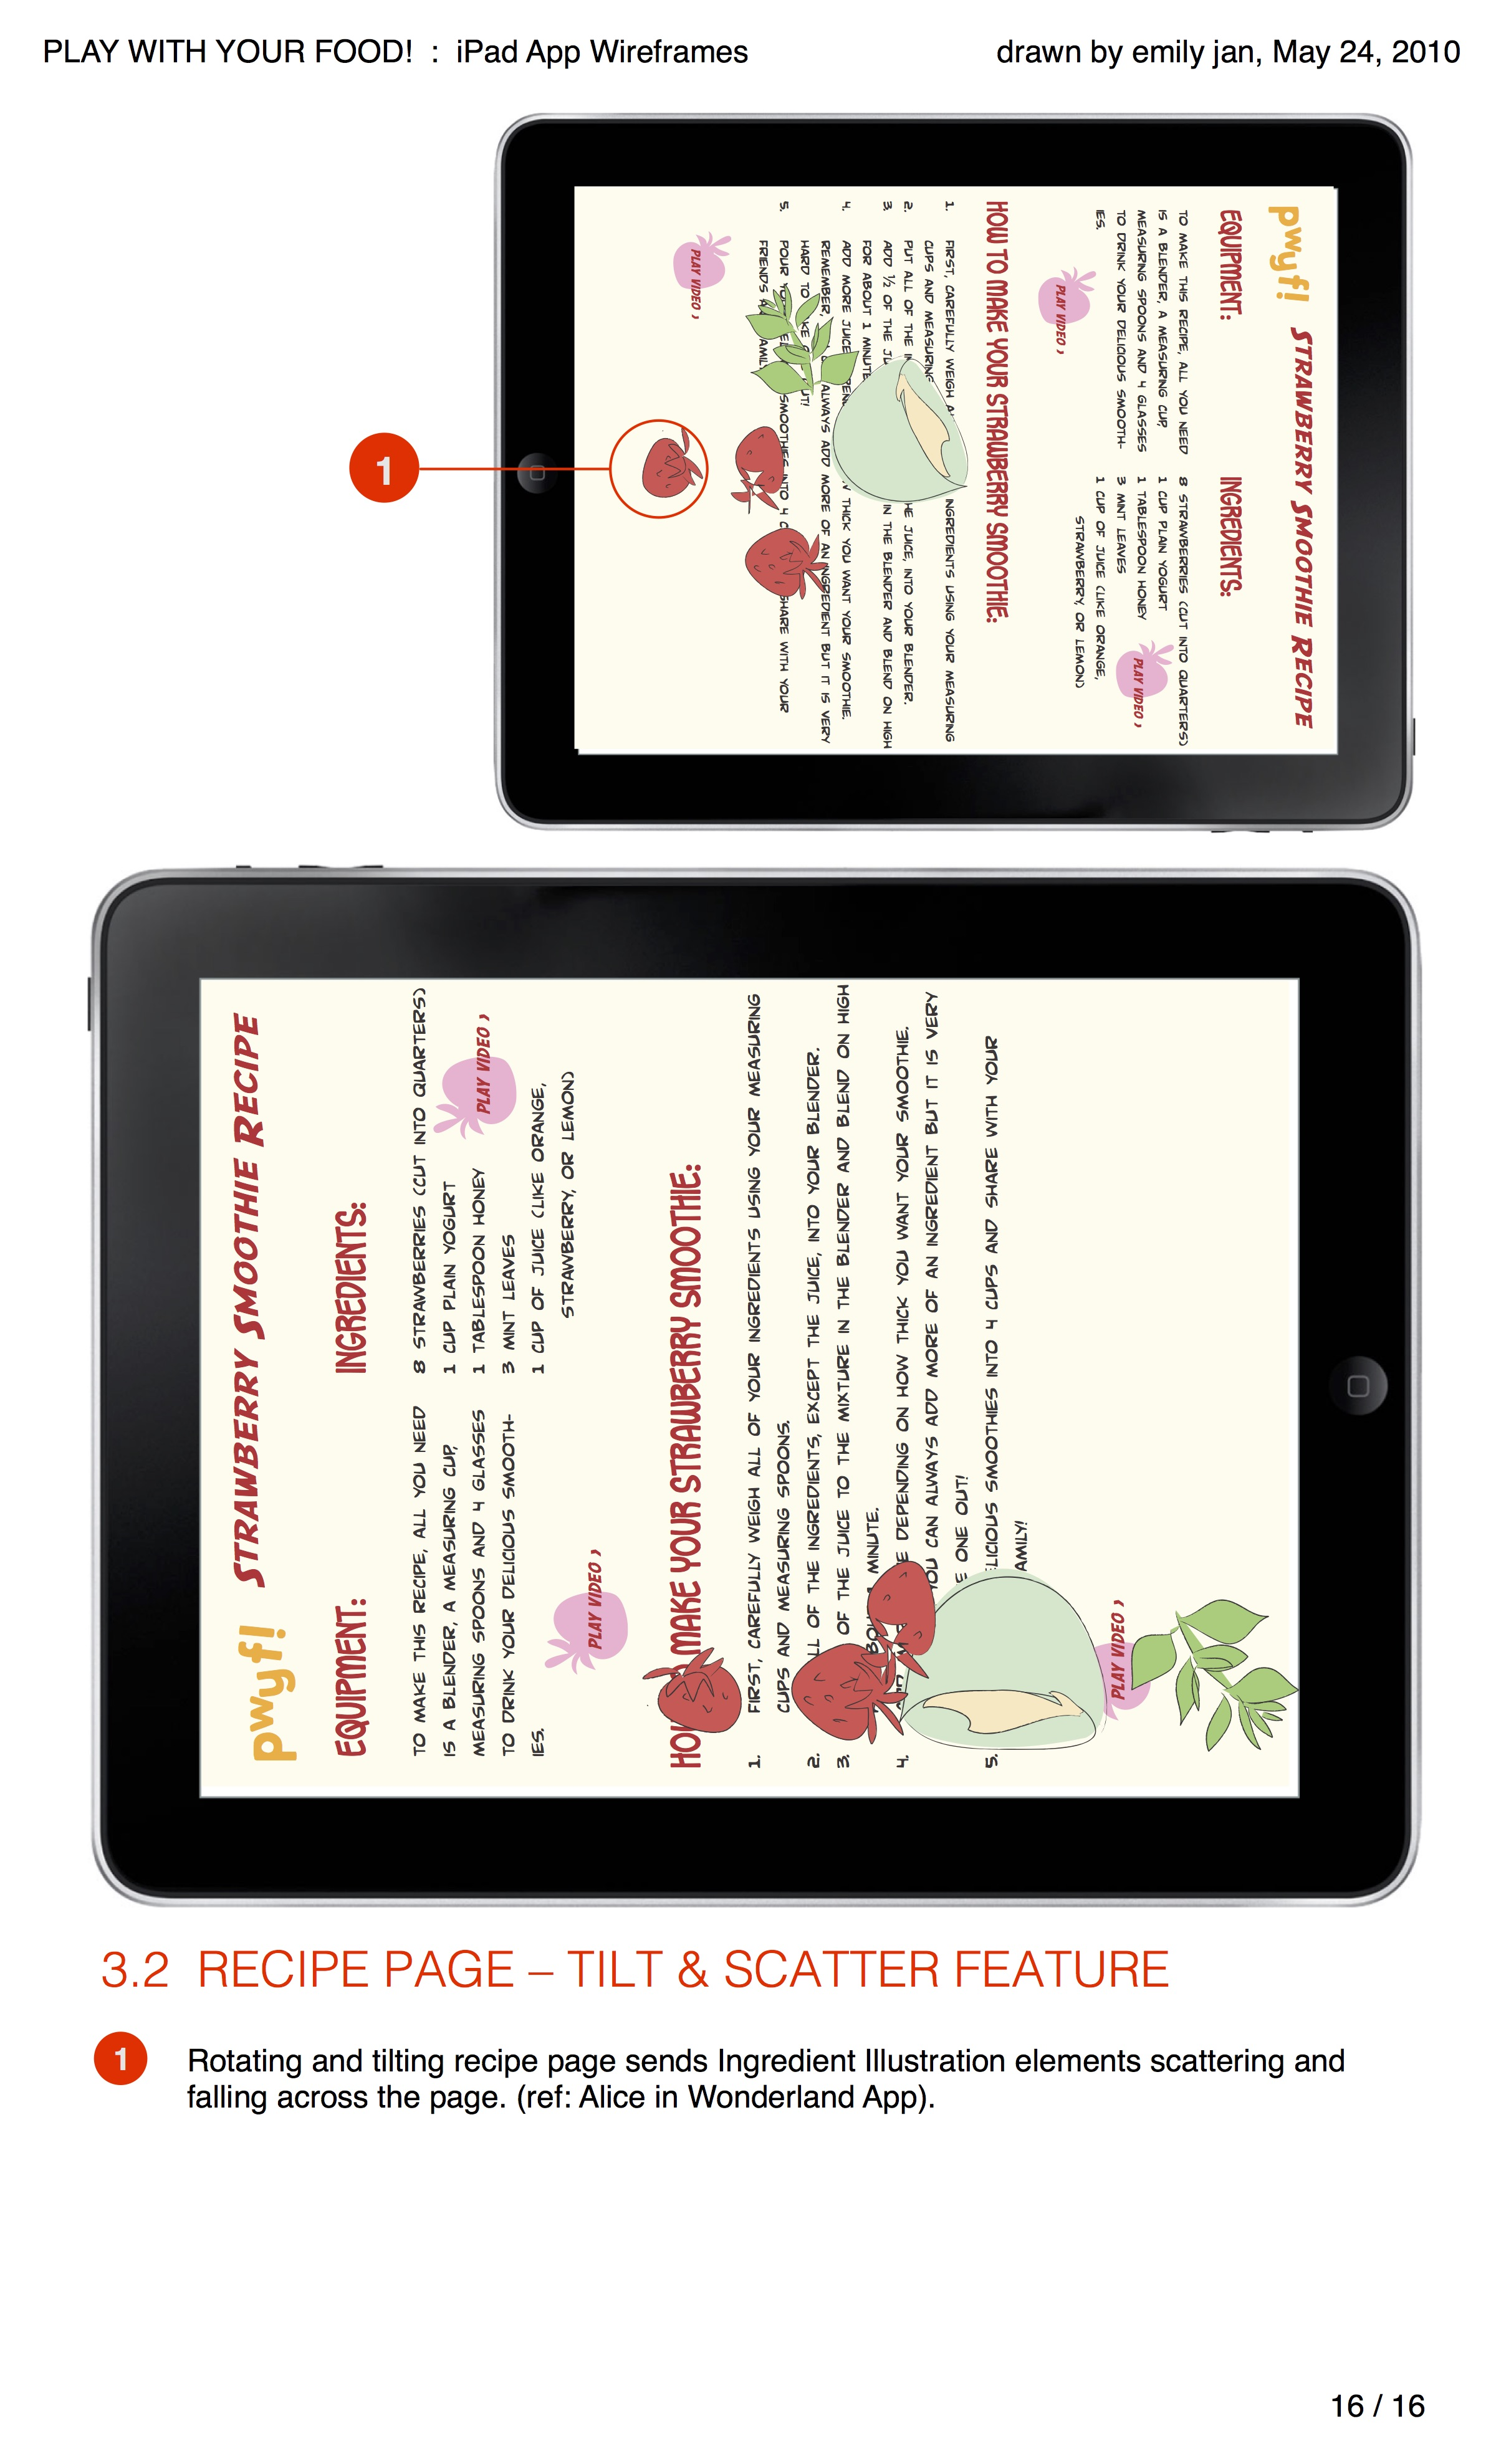 PWYF!_iPadApp_wireframes_large.9.jpg